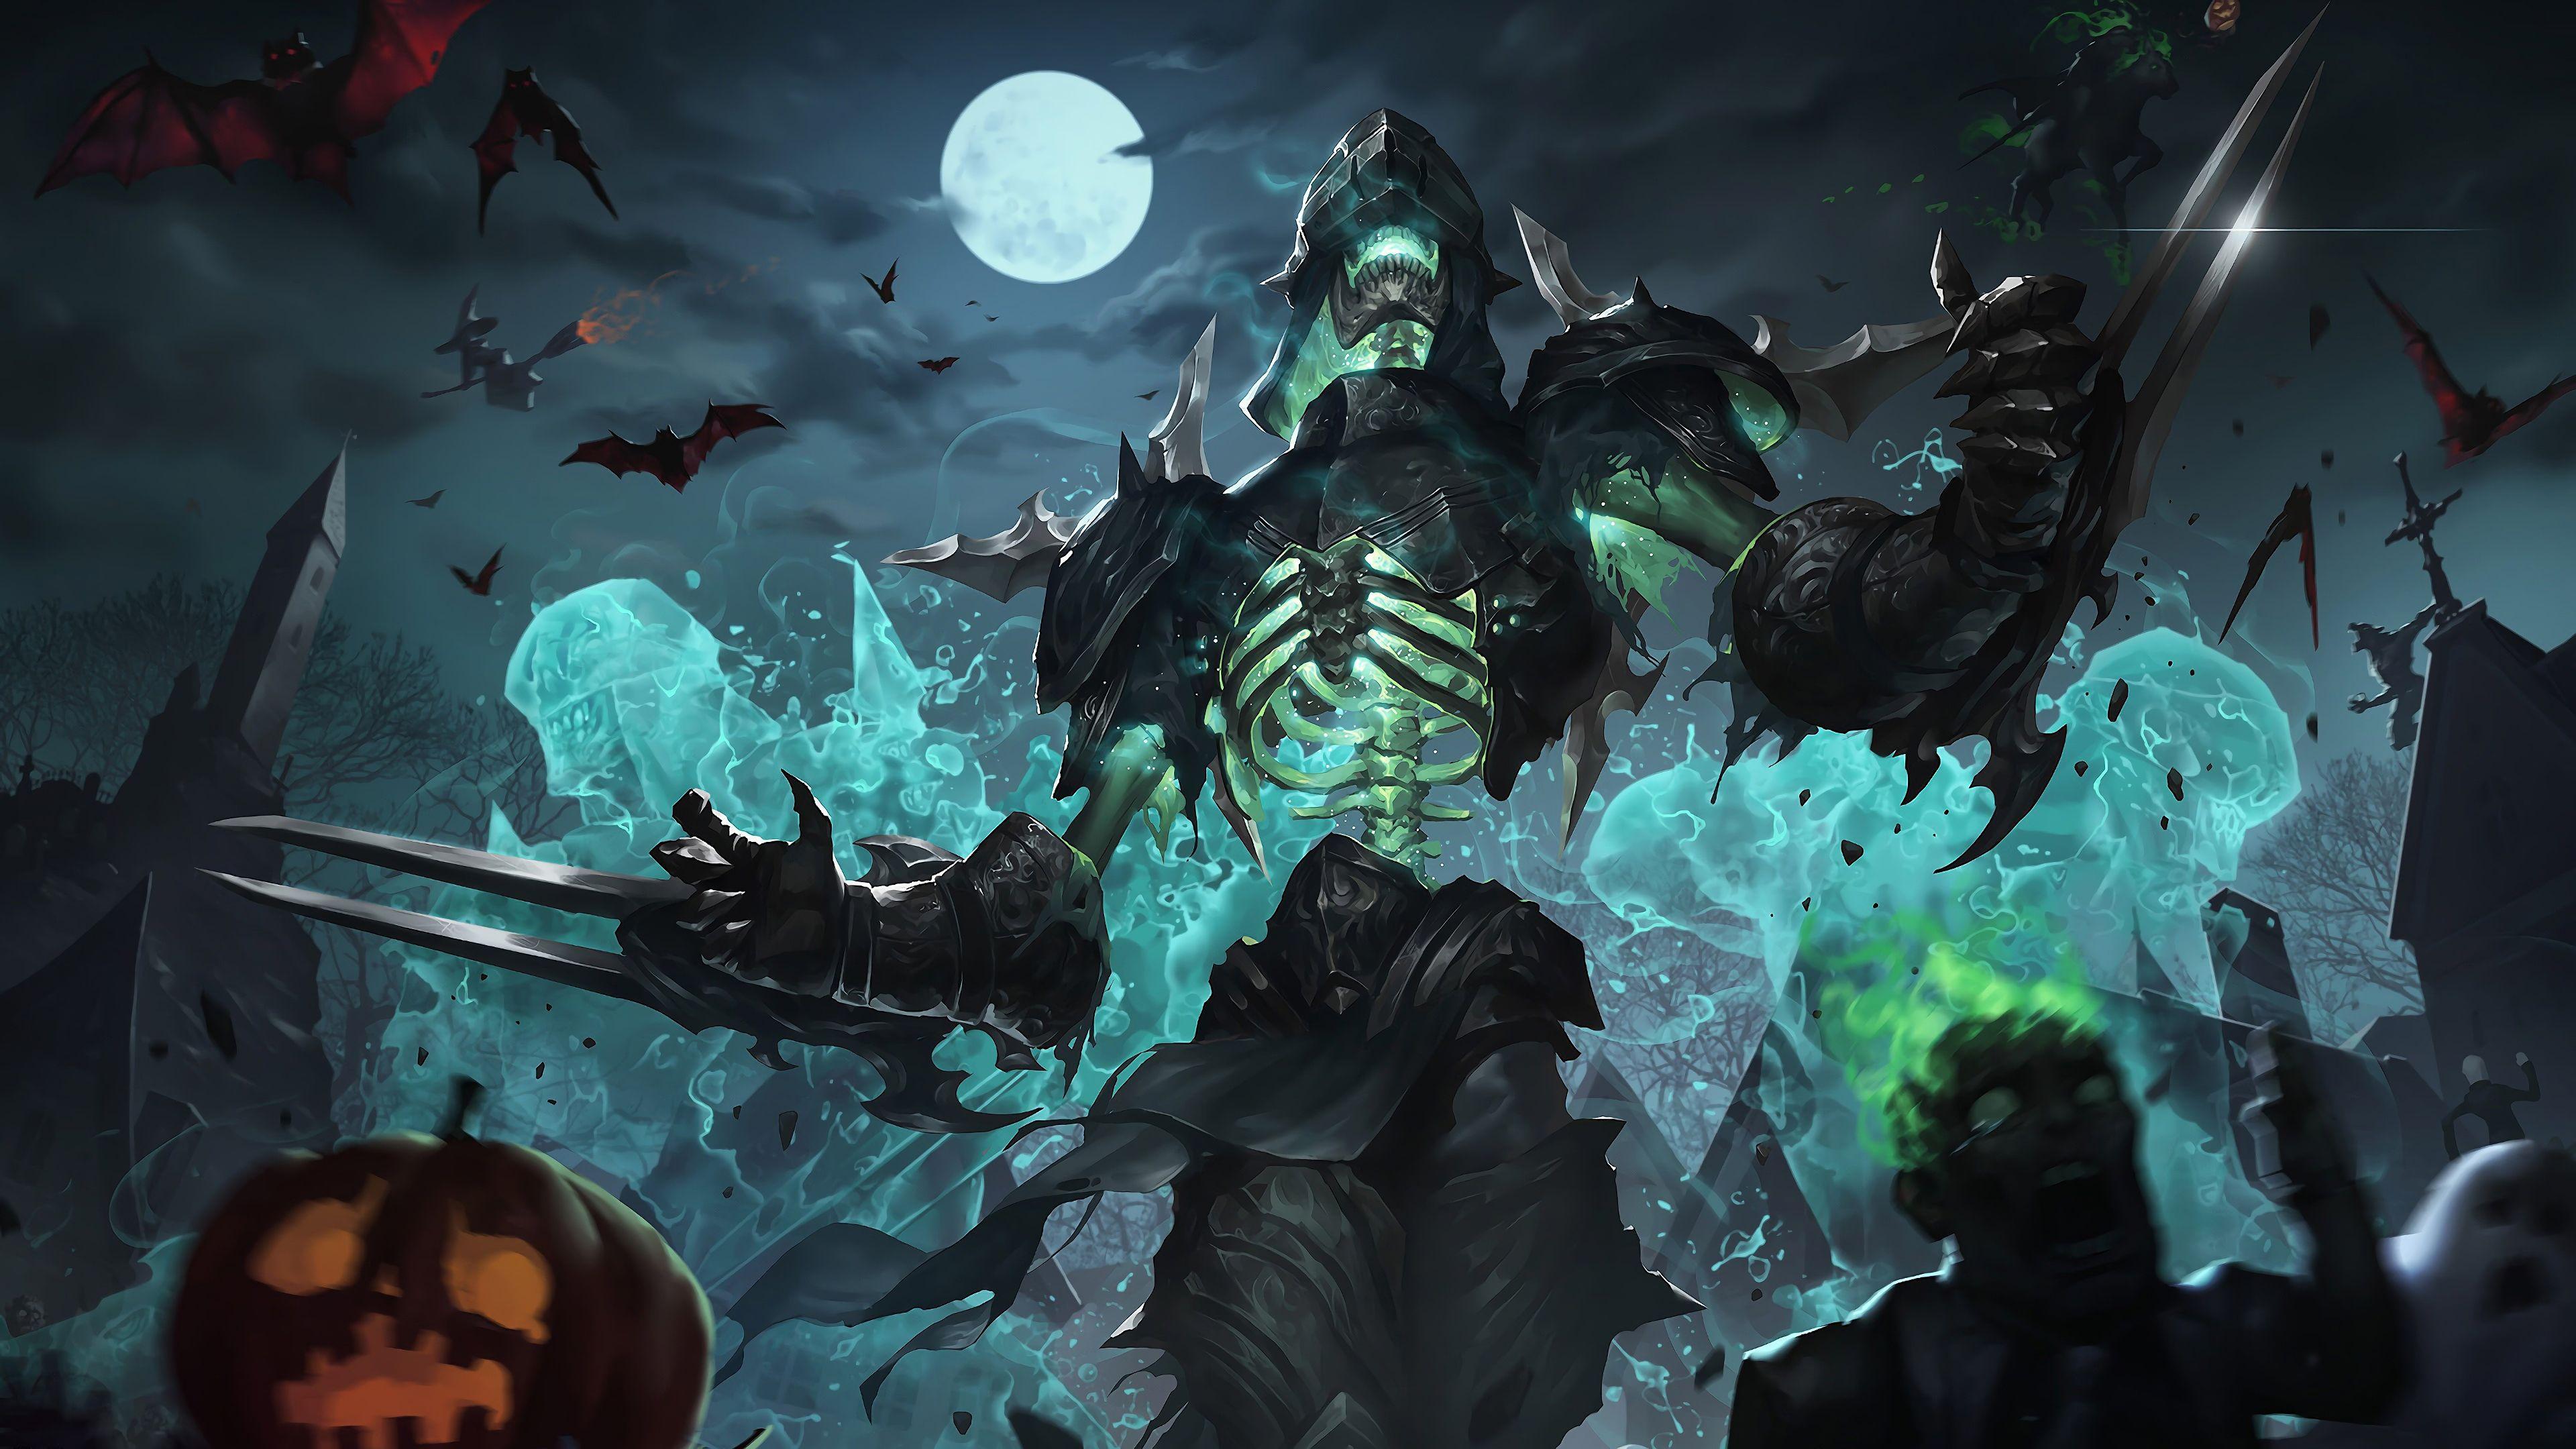 League Of Legends Zed Wallpapers Top Free League Of Legends Zed Backgrounds Wallpaperaccess